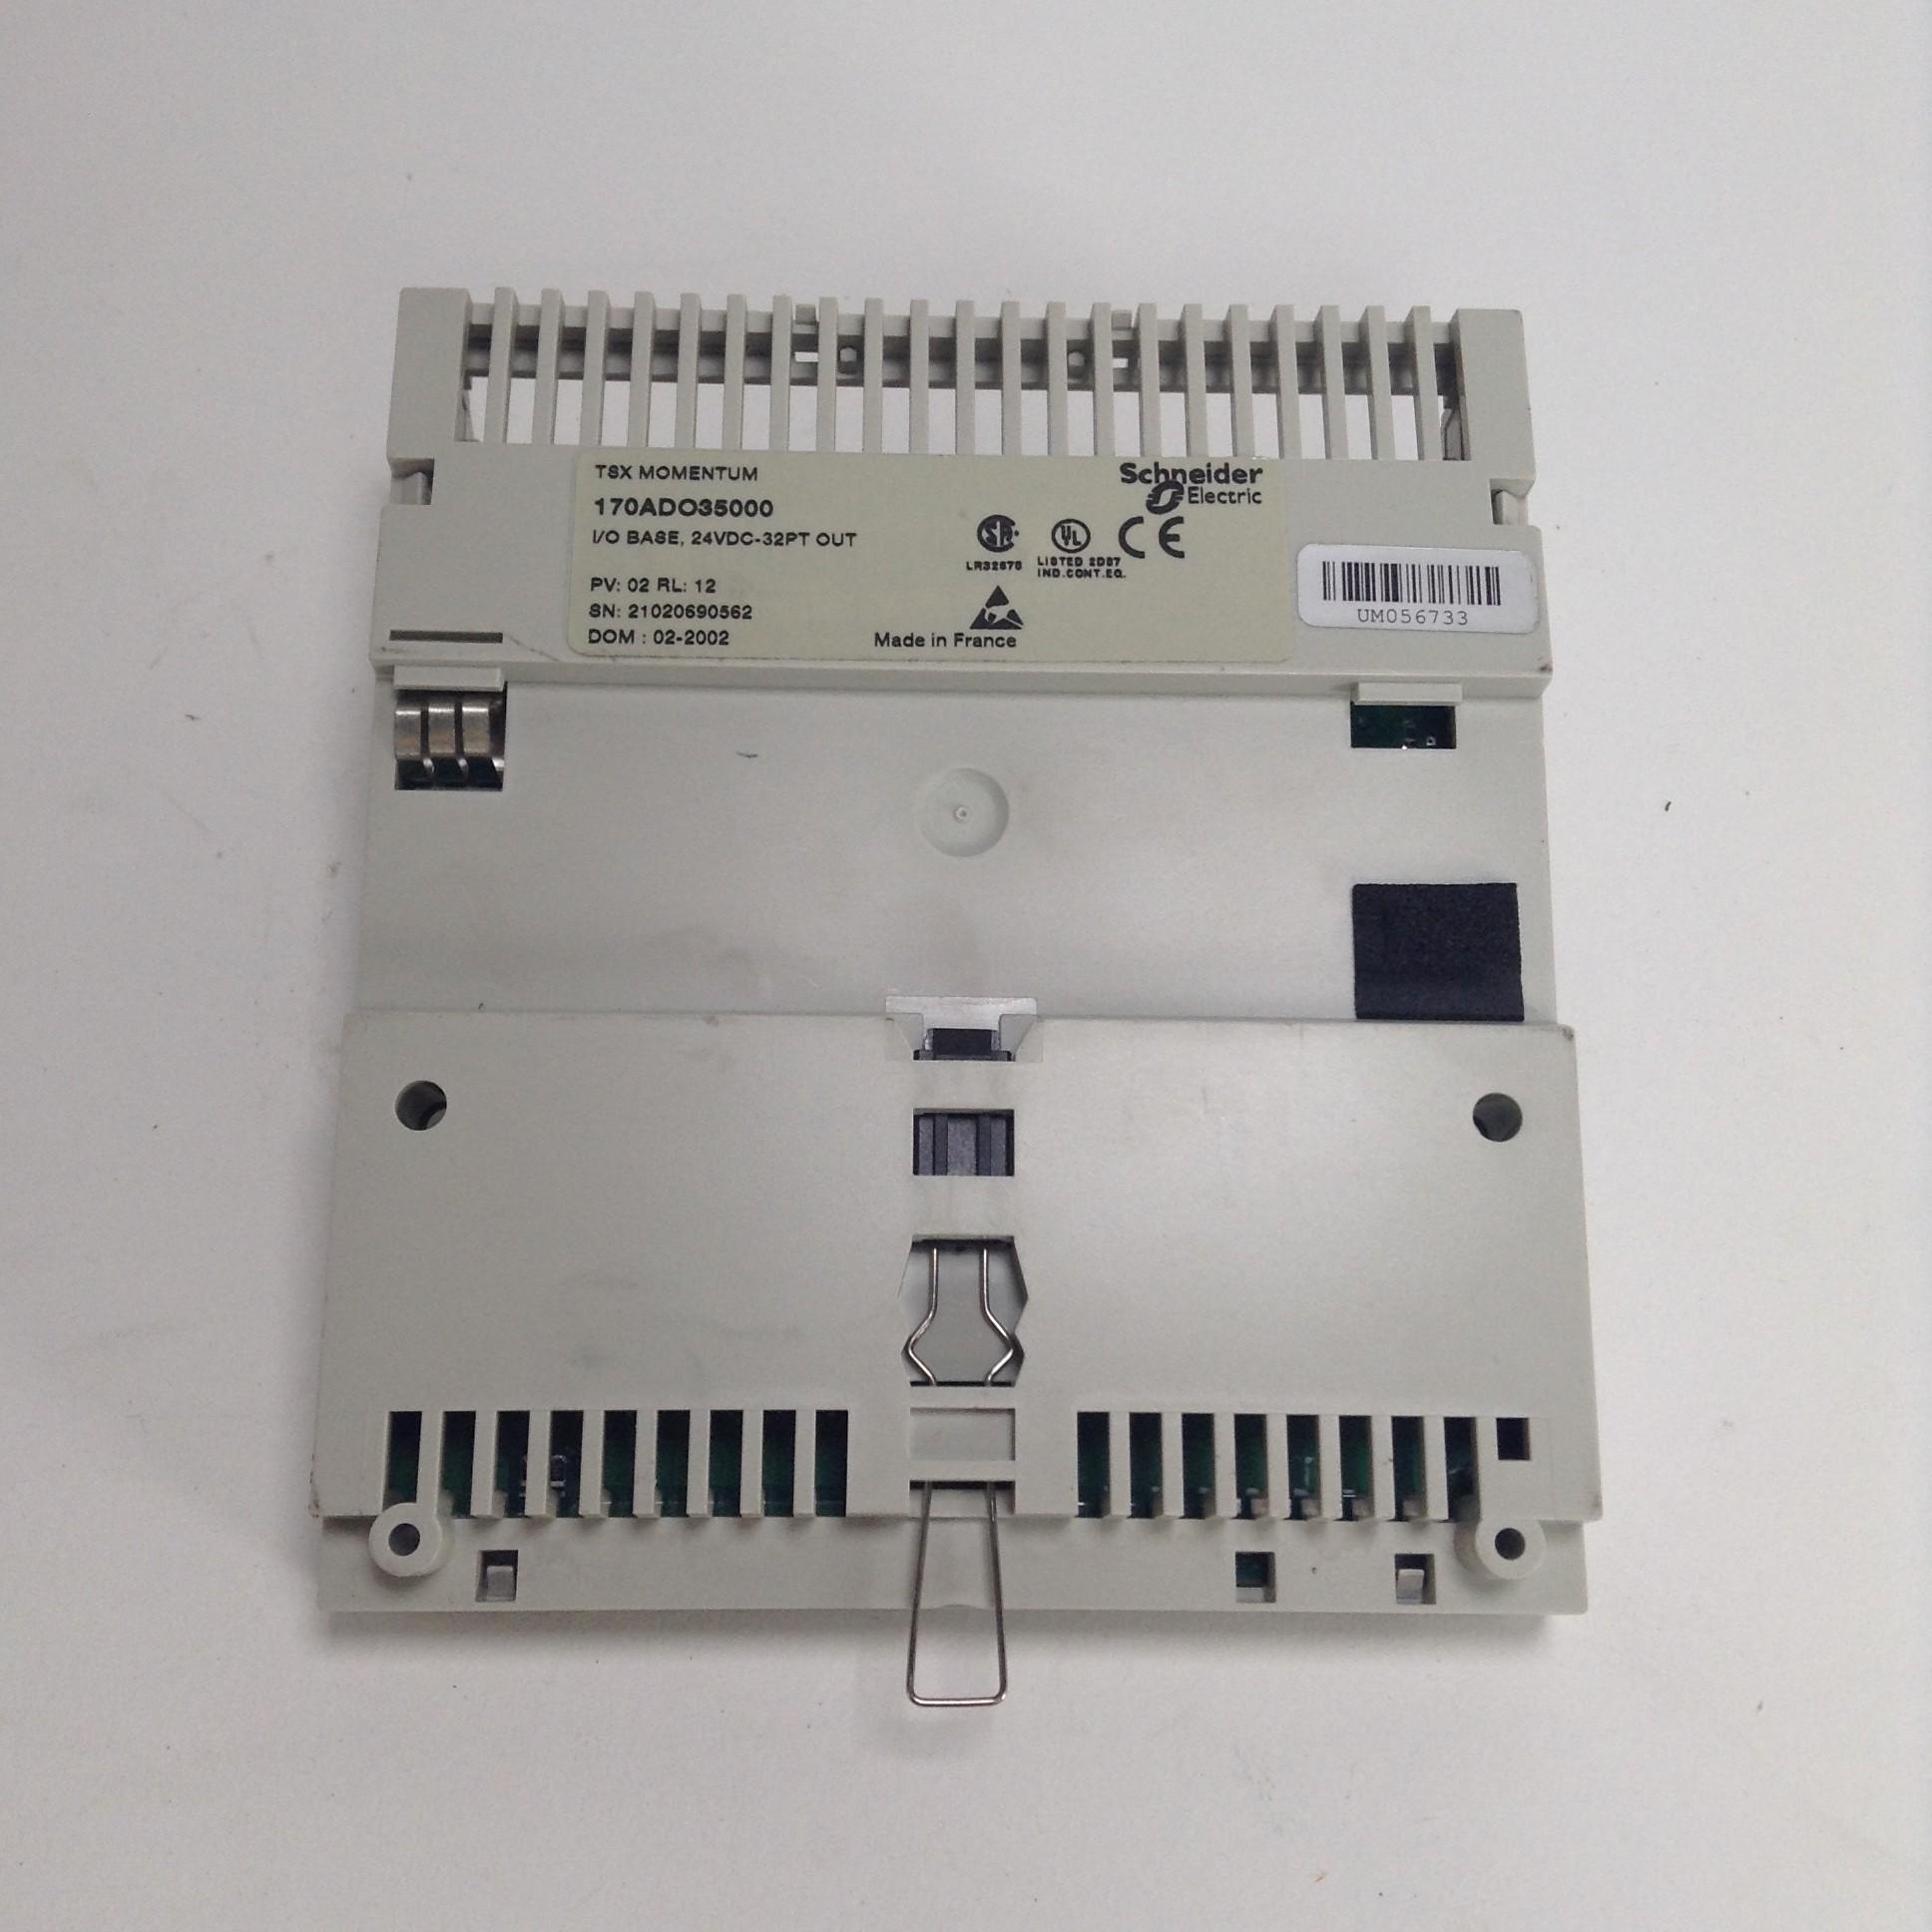 Schneider TSX Momentum I//O Base   170ADI35000  USED